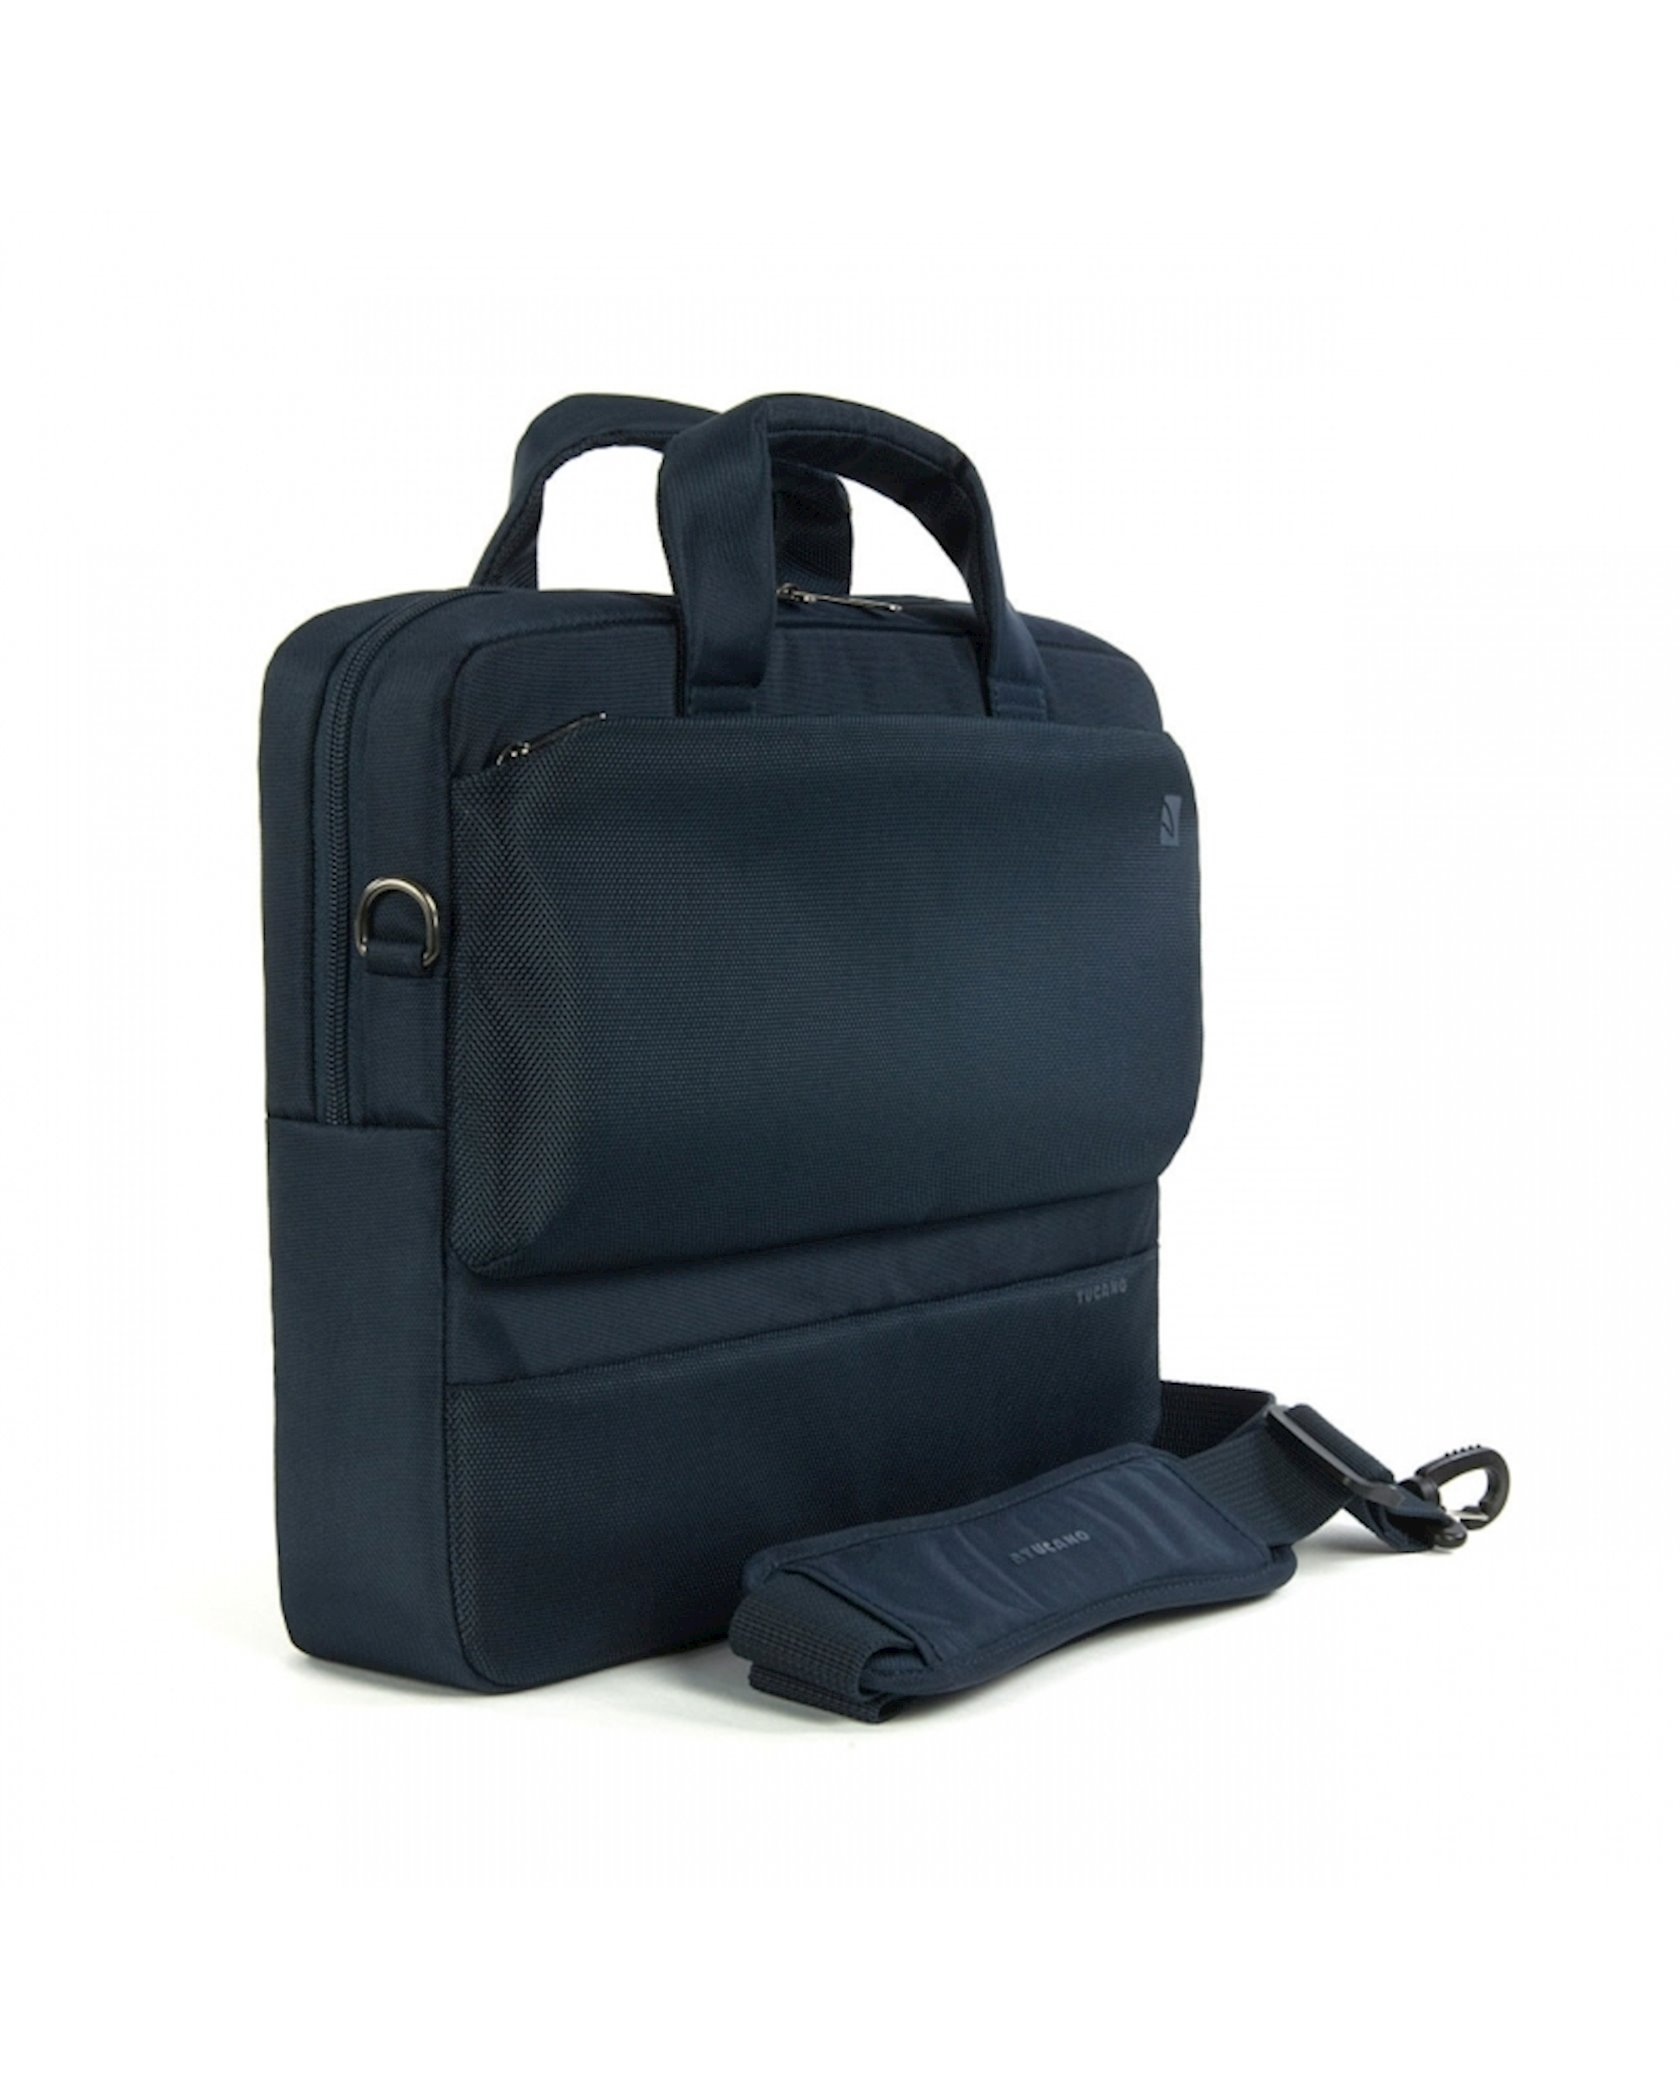 Noutbuk üçün çanta Tucano Dritta Slim Bag 13/14 Blue